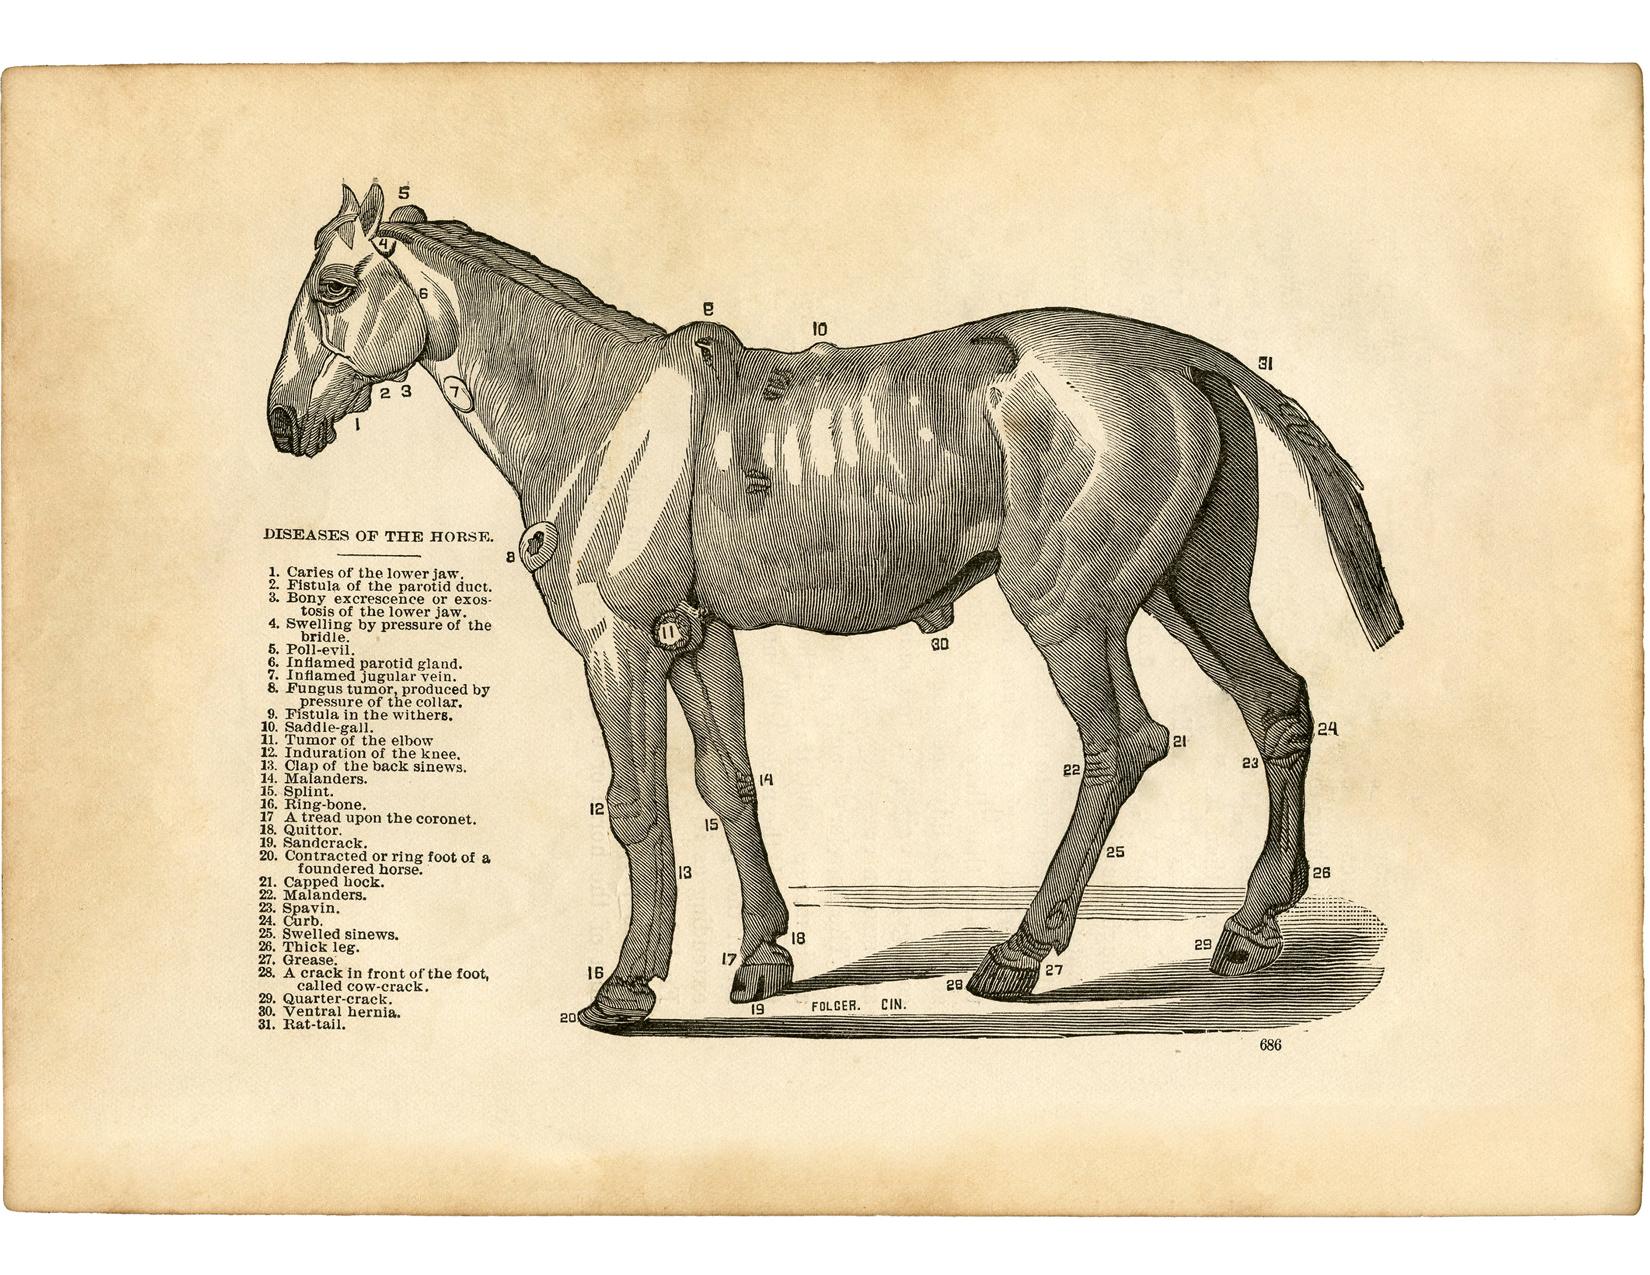 Vintage Horse Diseases Diagram - Unusual! - The Graphics Fairy